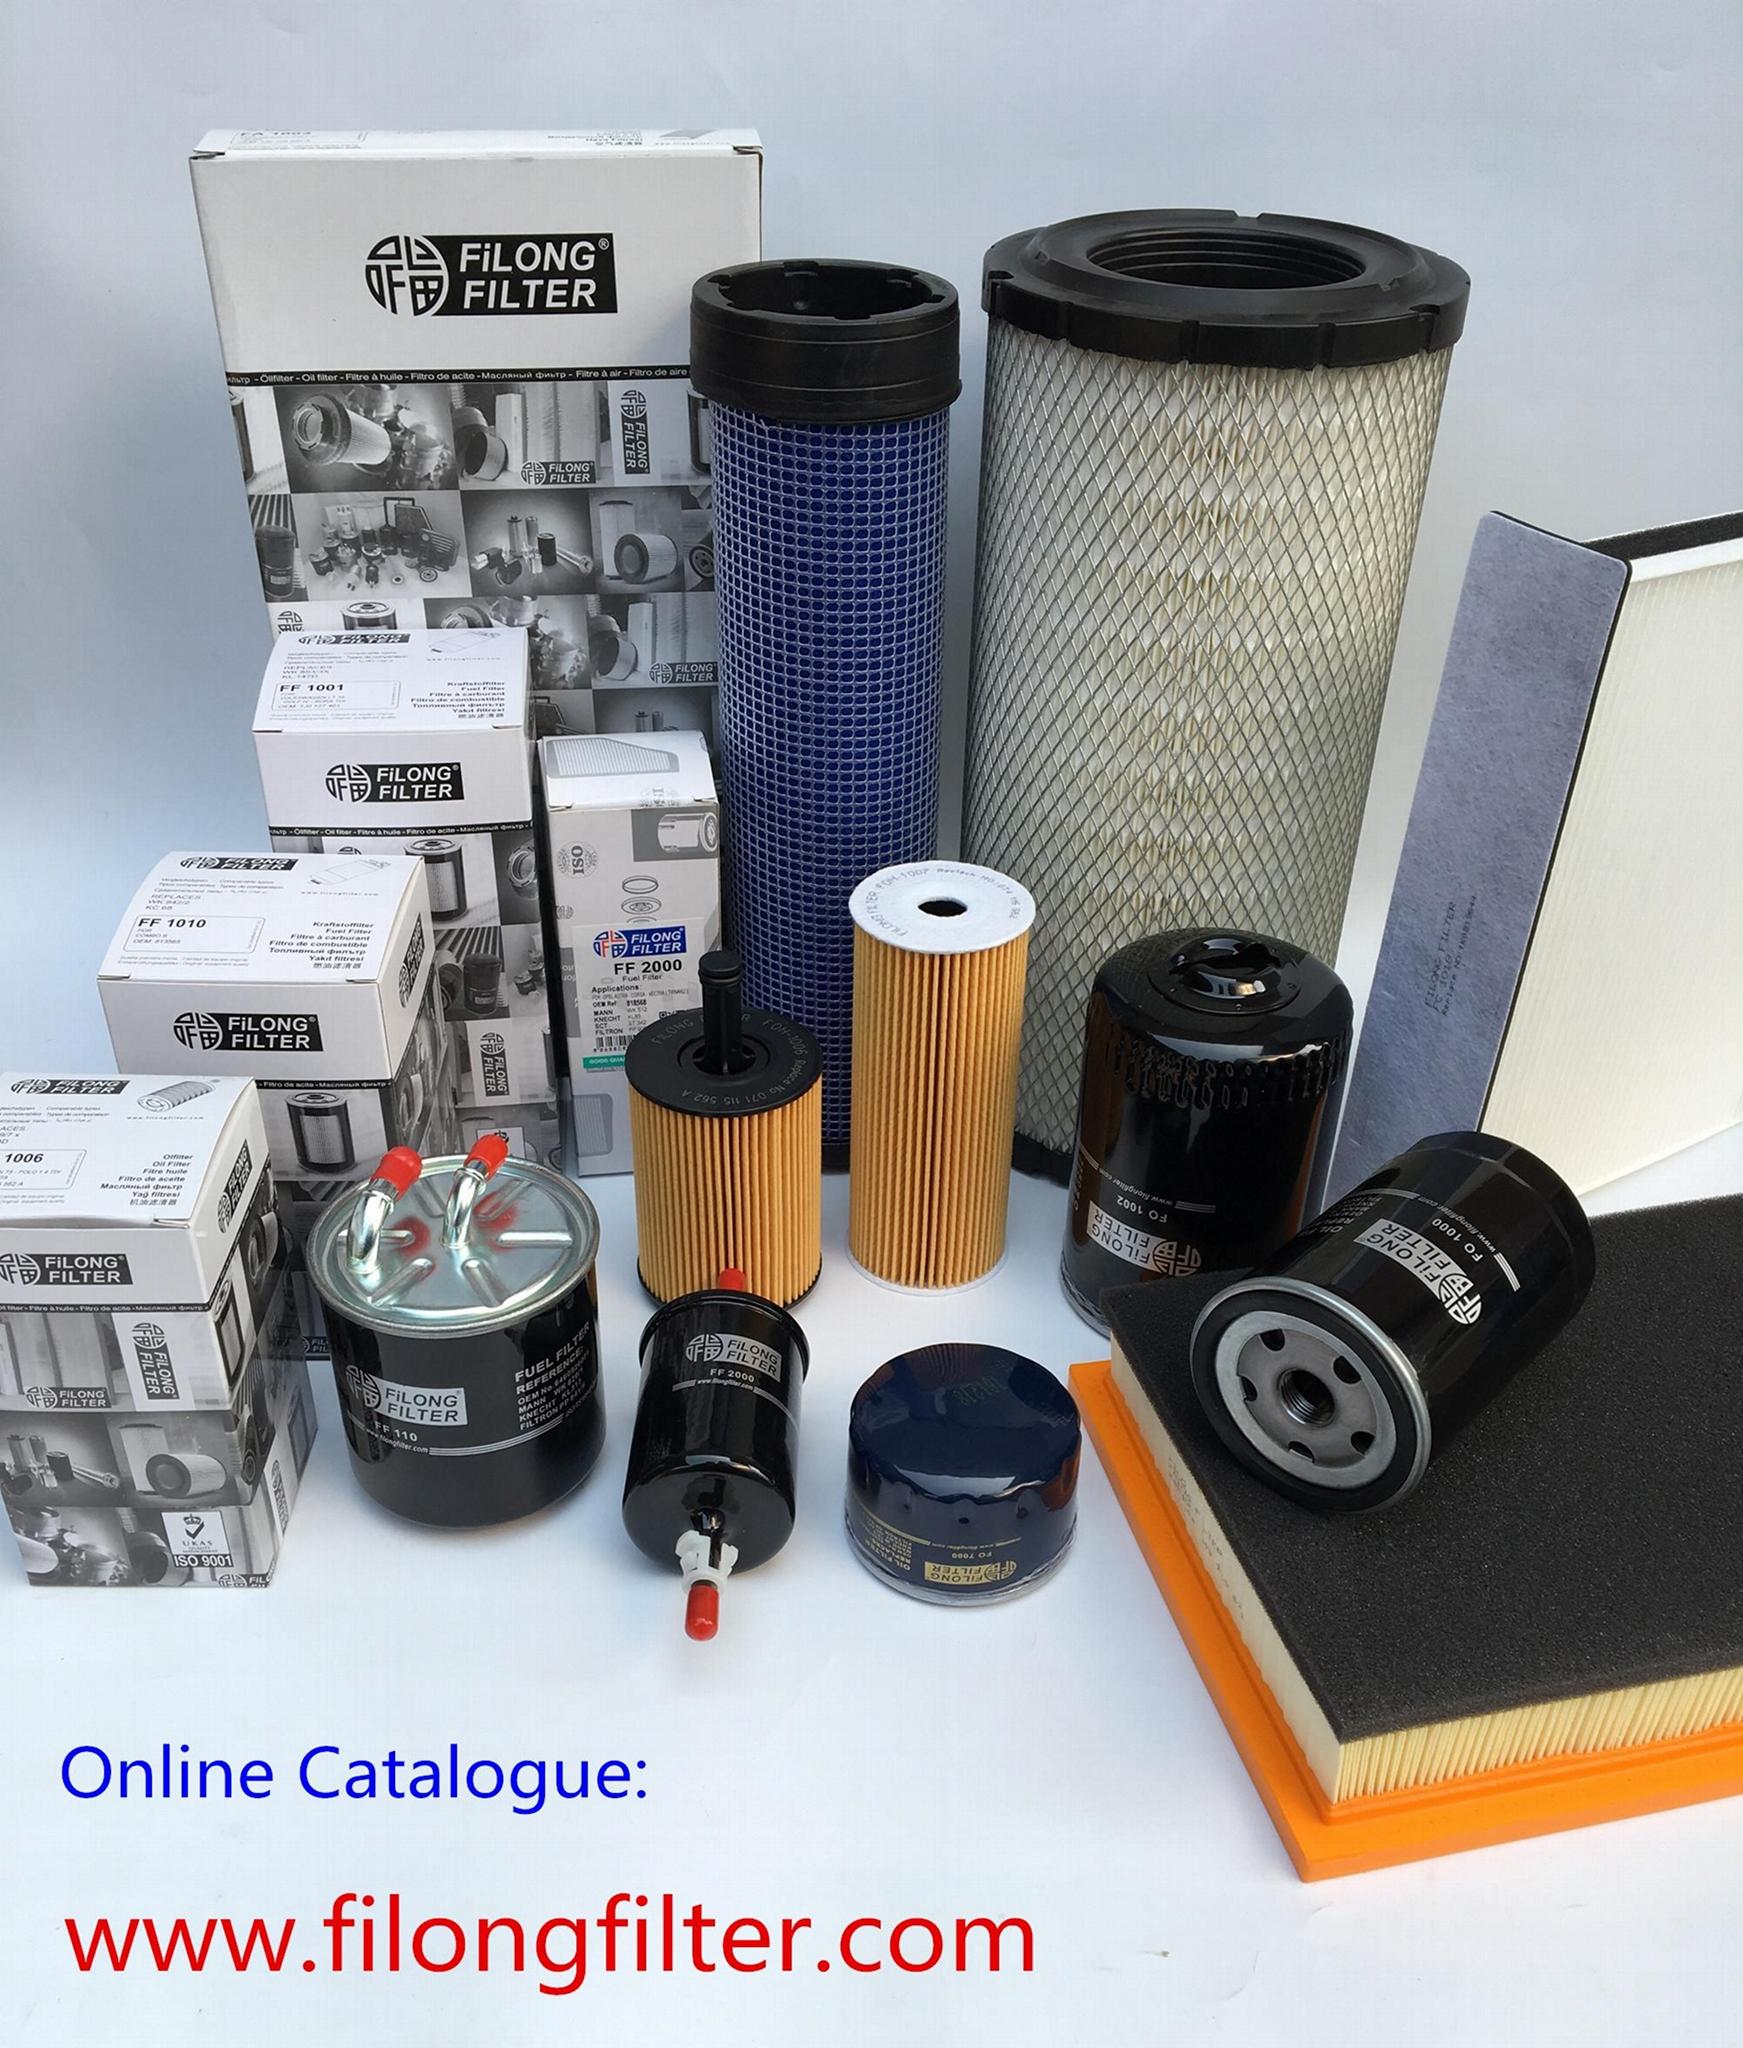 FILONG Manufactory Fuel Filter for MItsubish  MB220900 31945-44000 31973-44000 23303-87309 WK940/16 WK940/11X FILONG FF70001